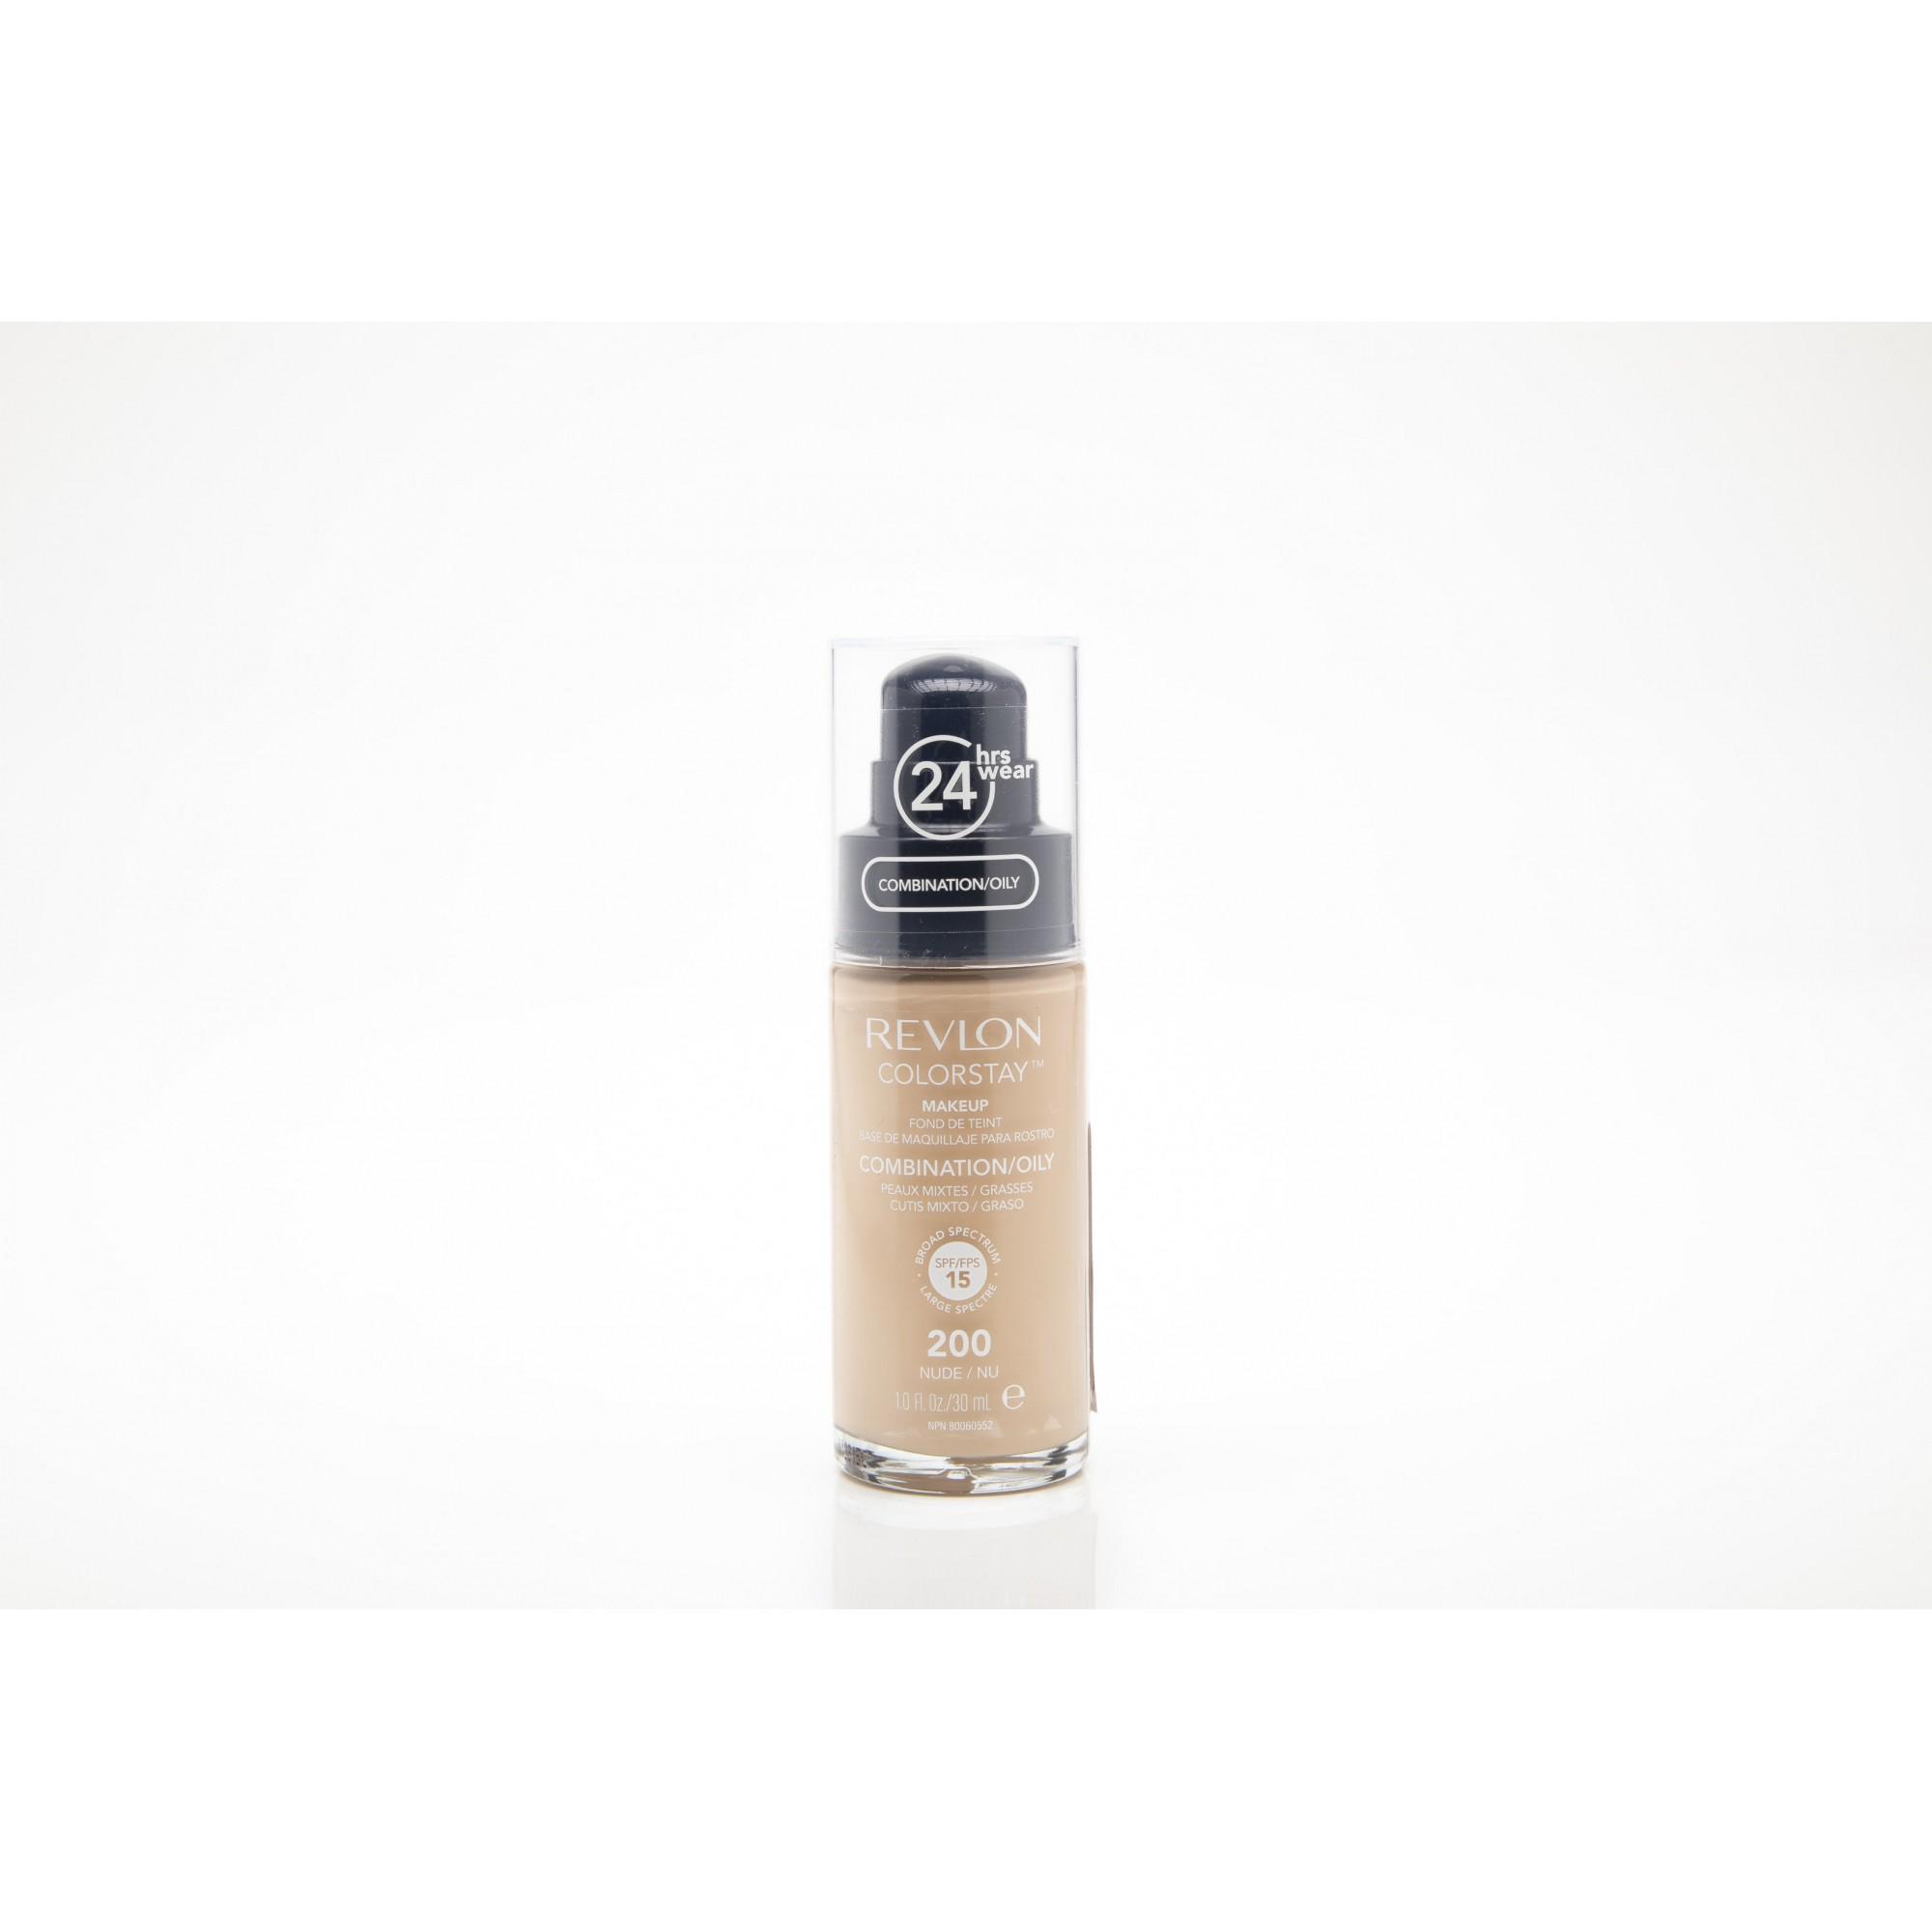 Base liquida colorstay para peles oleosas nude 200 Revlon